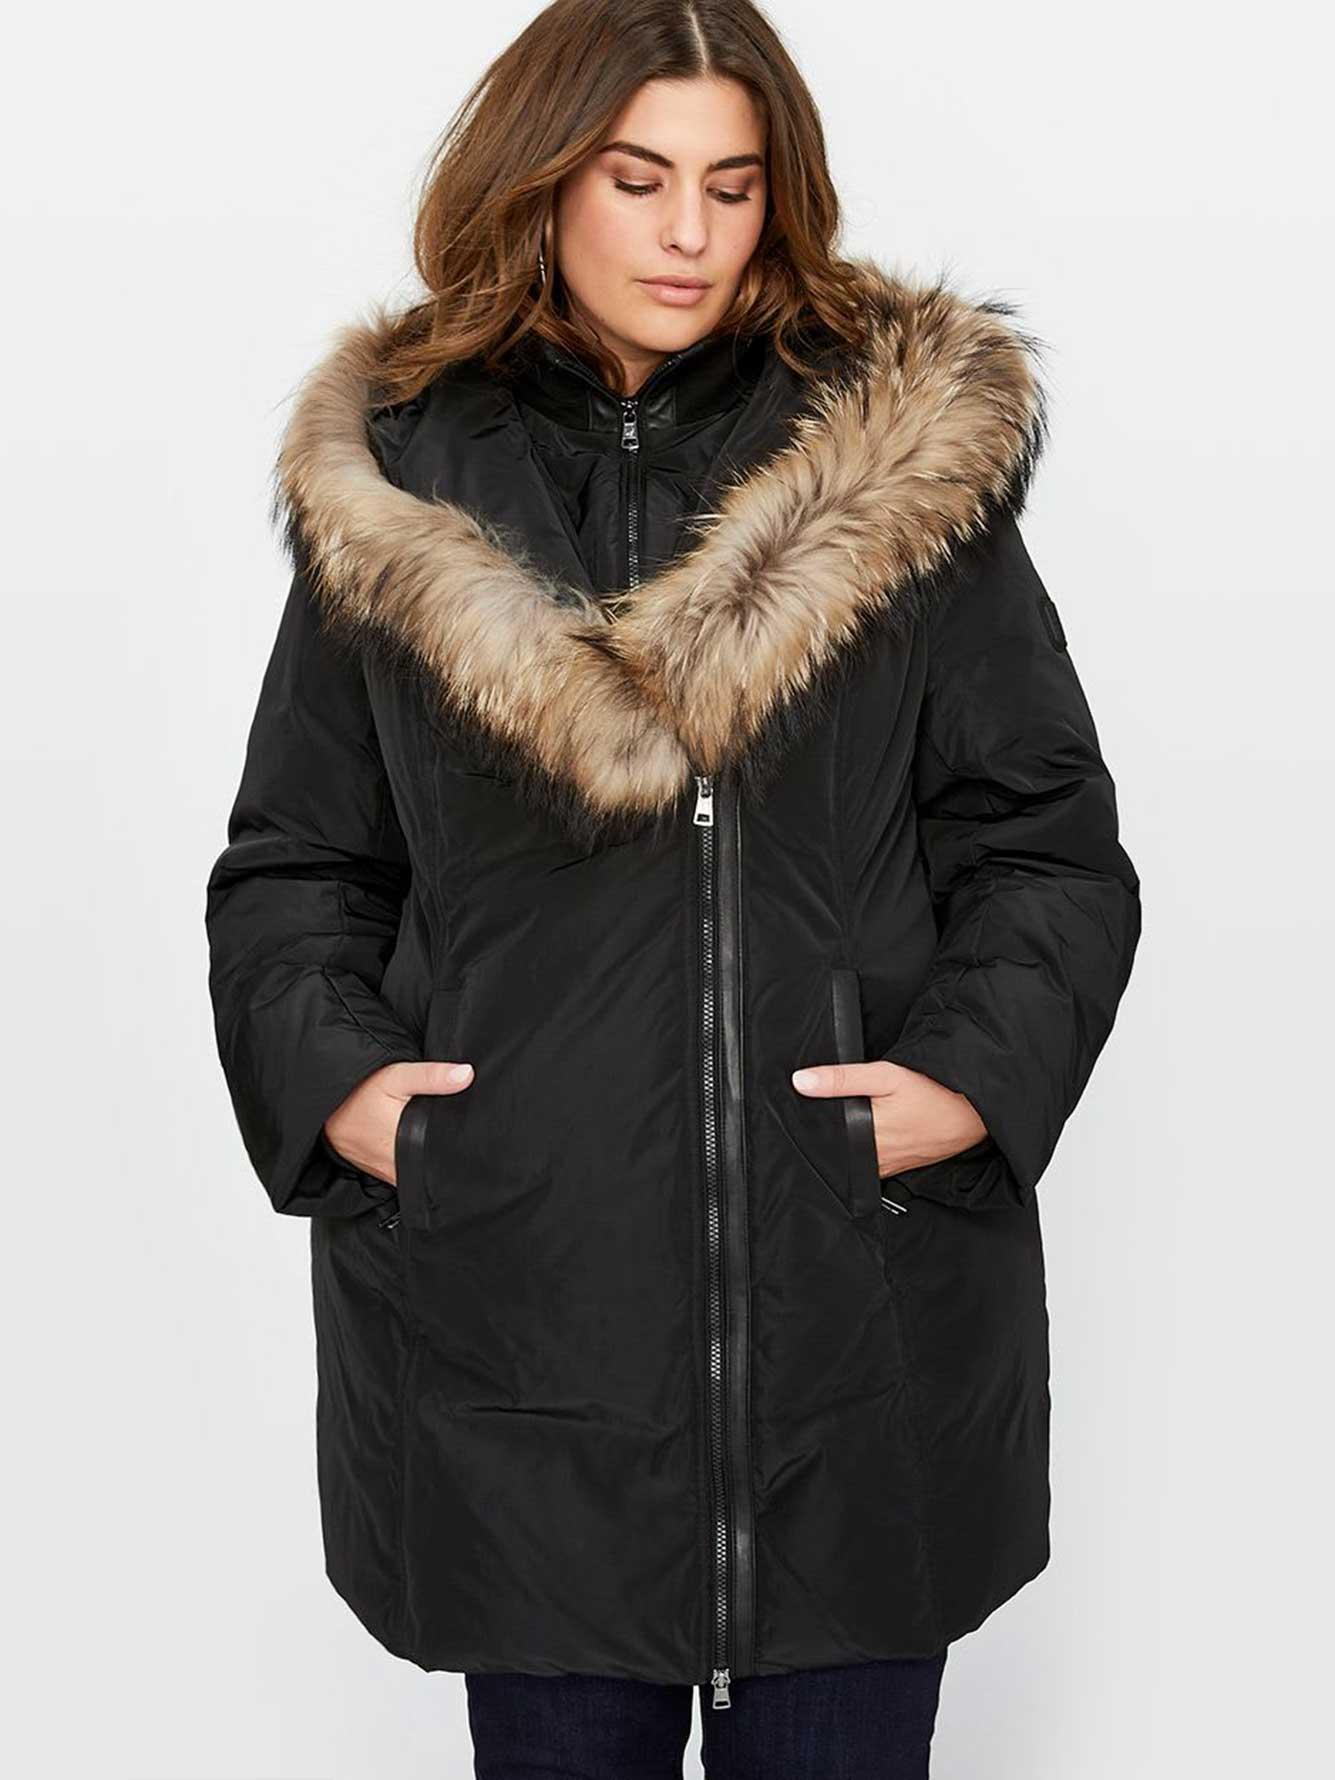 f32dceb19f9b2 Womens Winter Coats Plus Size 4x - Tradingbasis